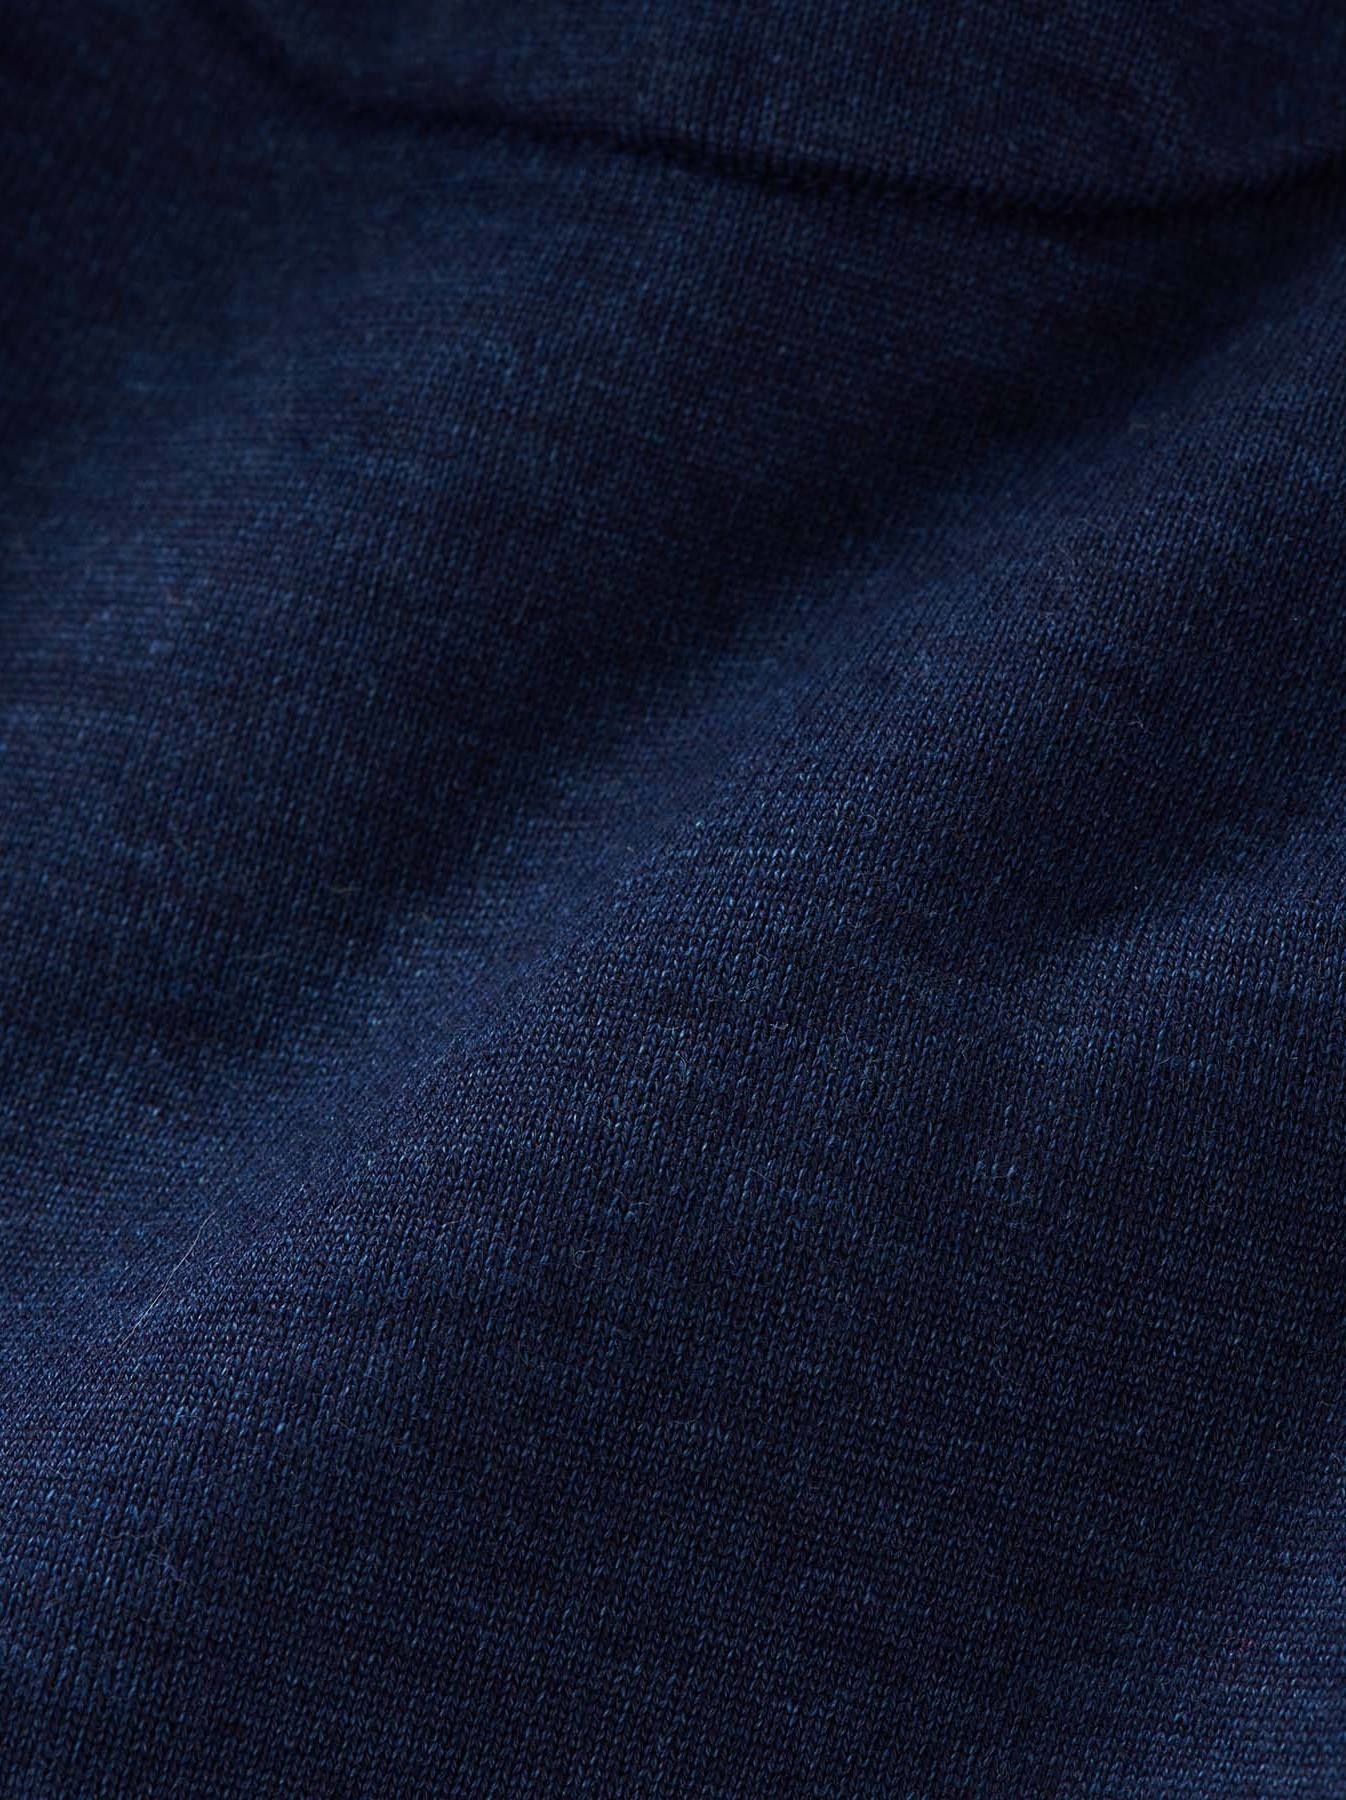 WH Indigo Mouton Fleecy 908 Hoodie Coat-11